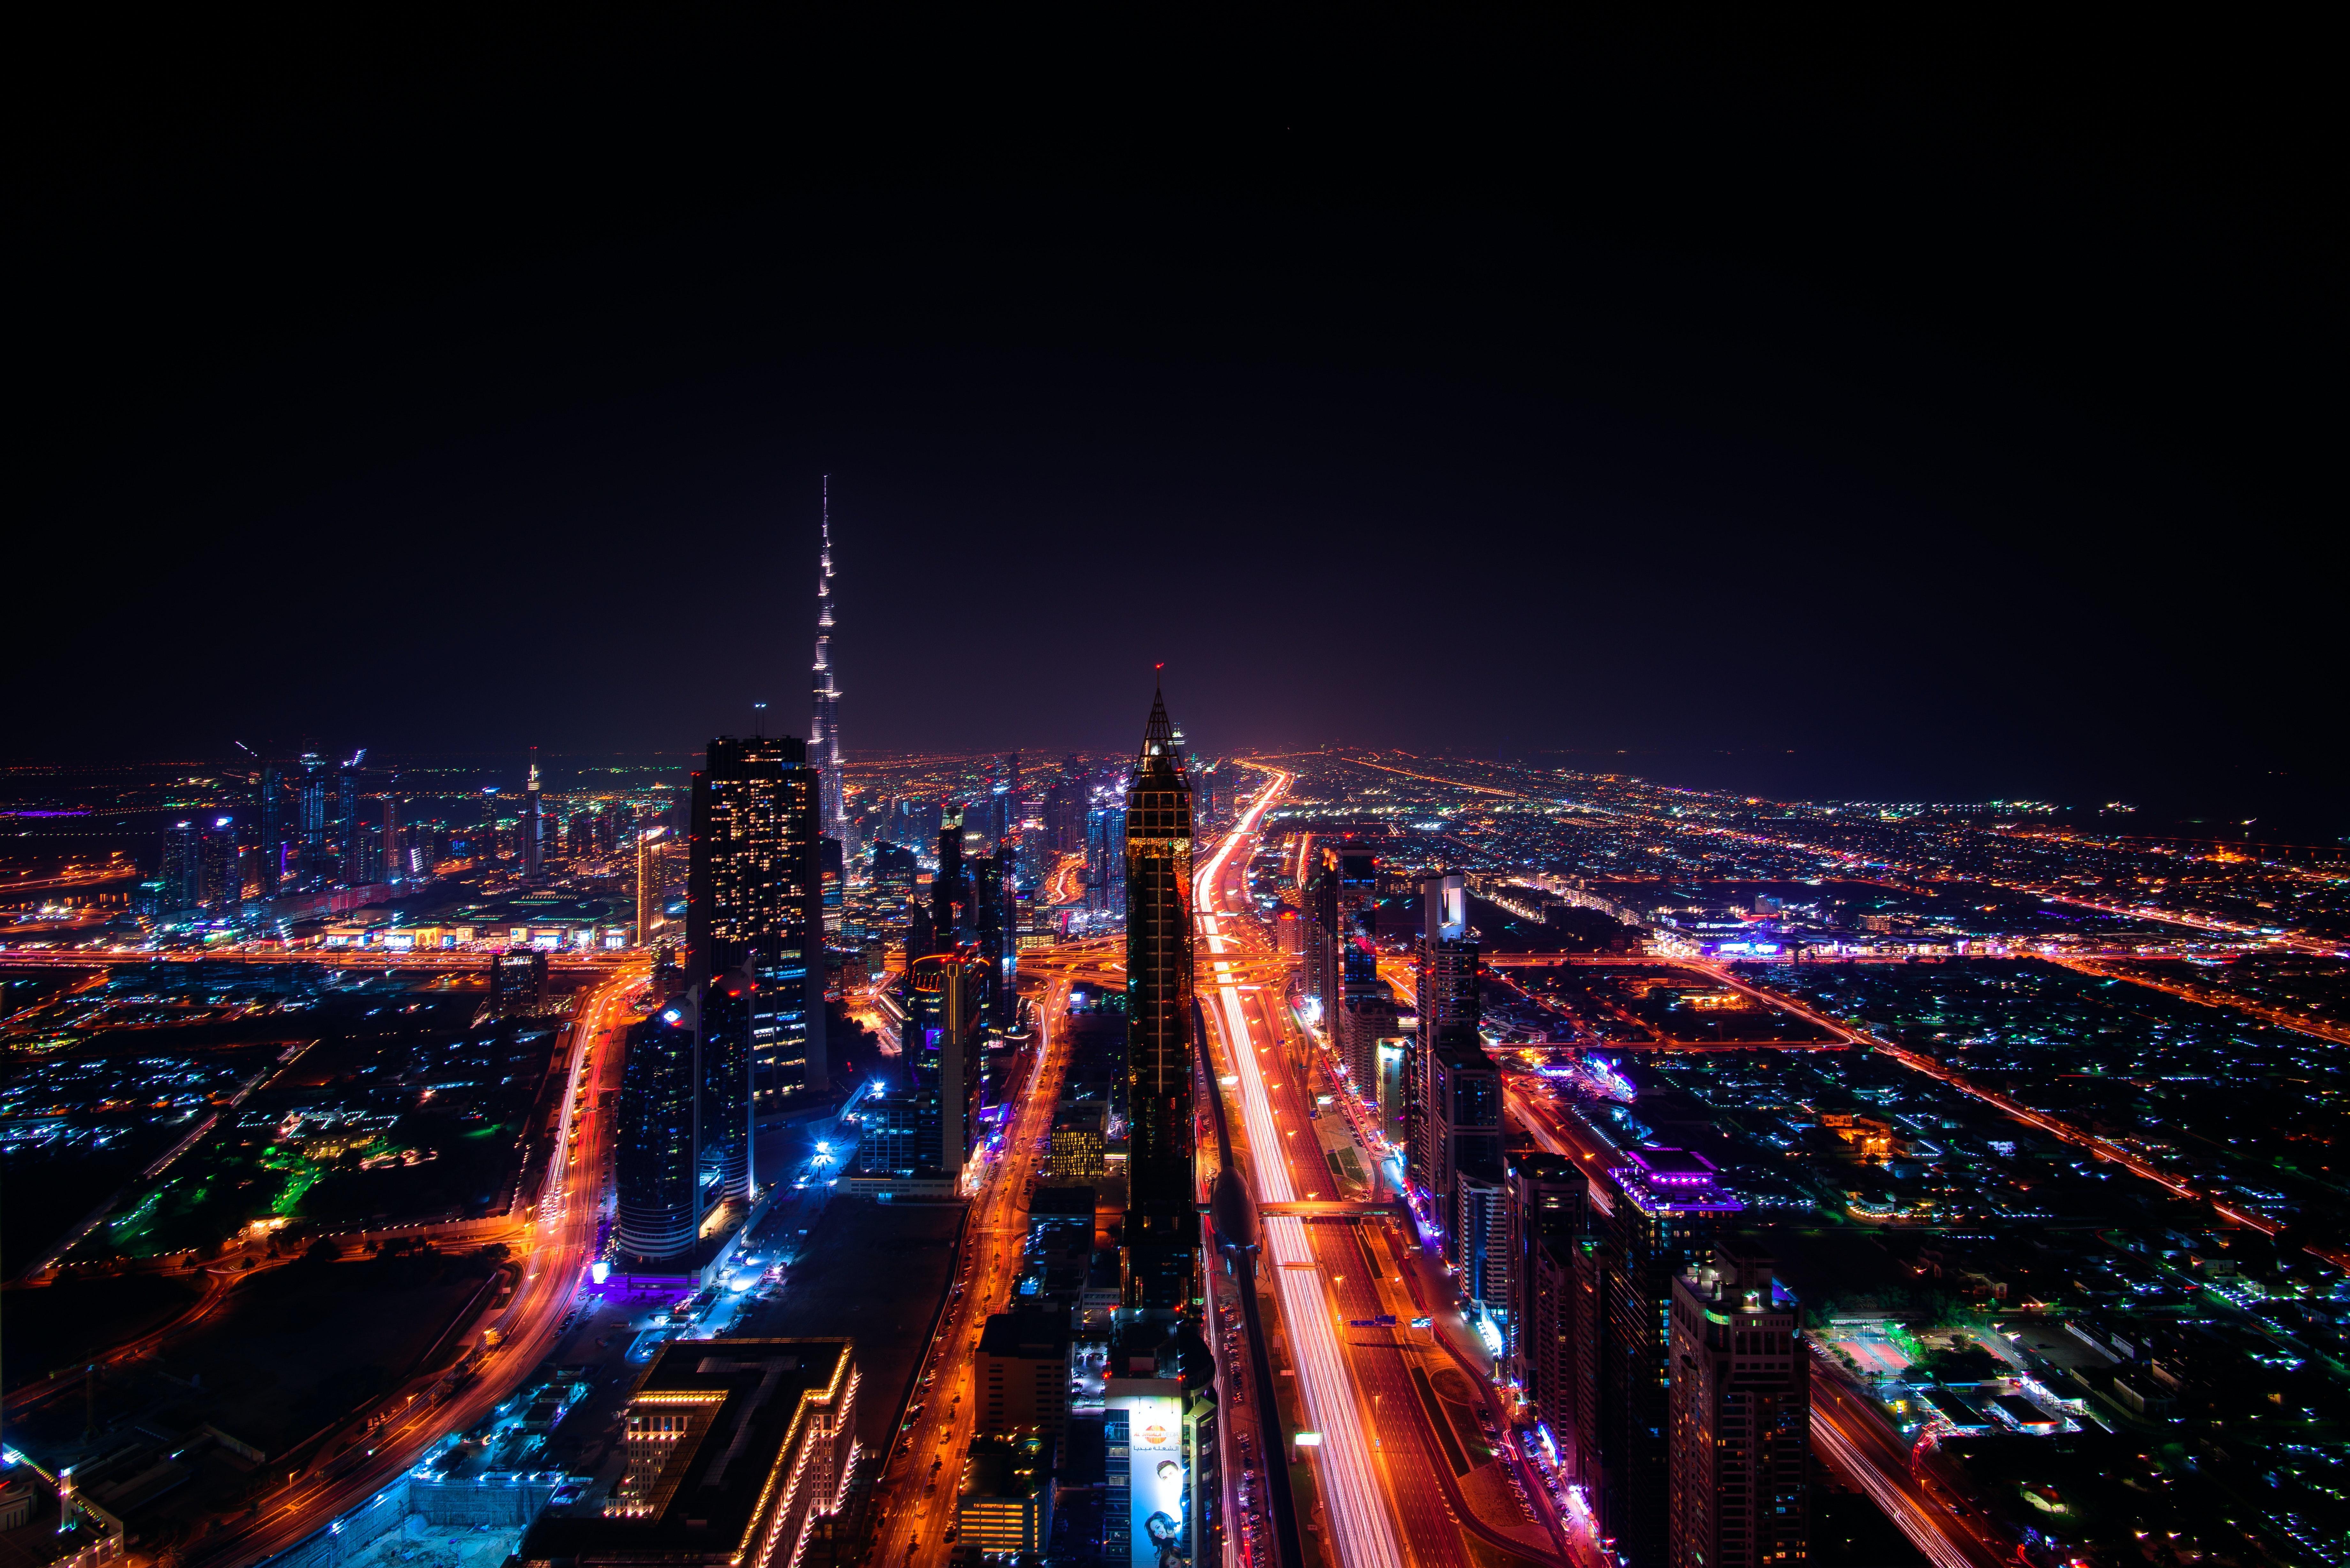 Night sklyline over city